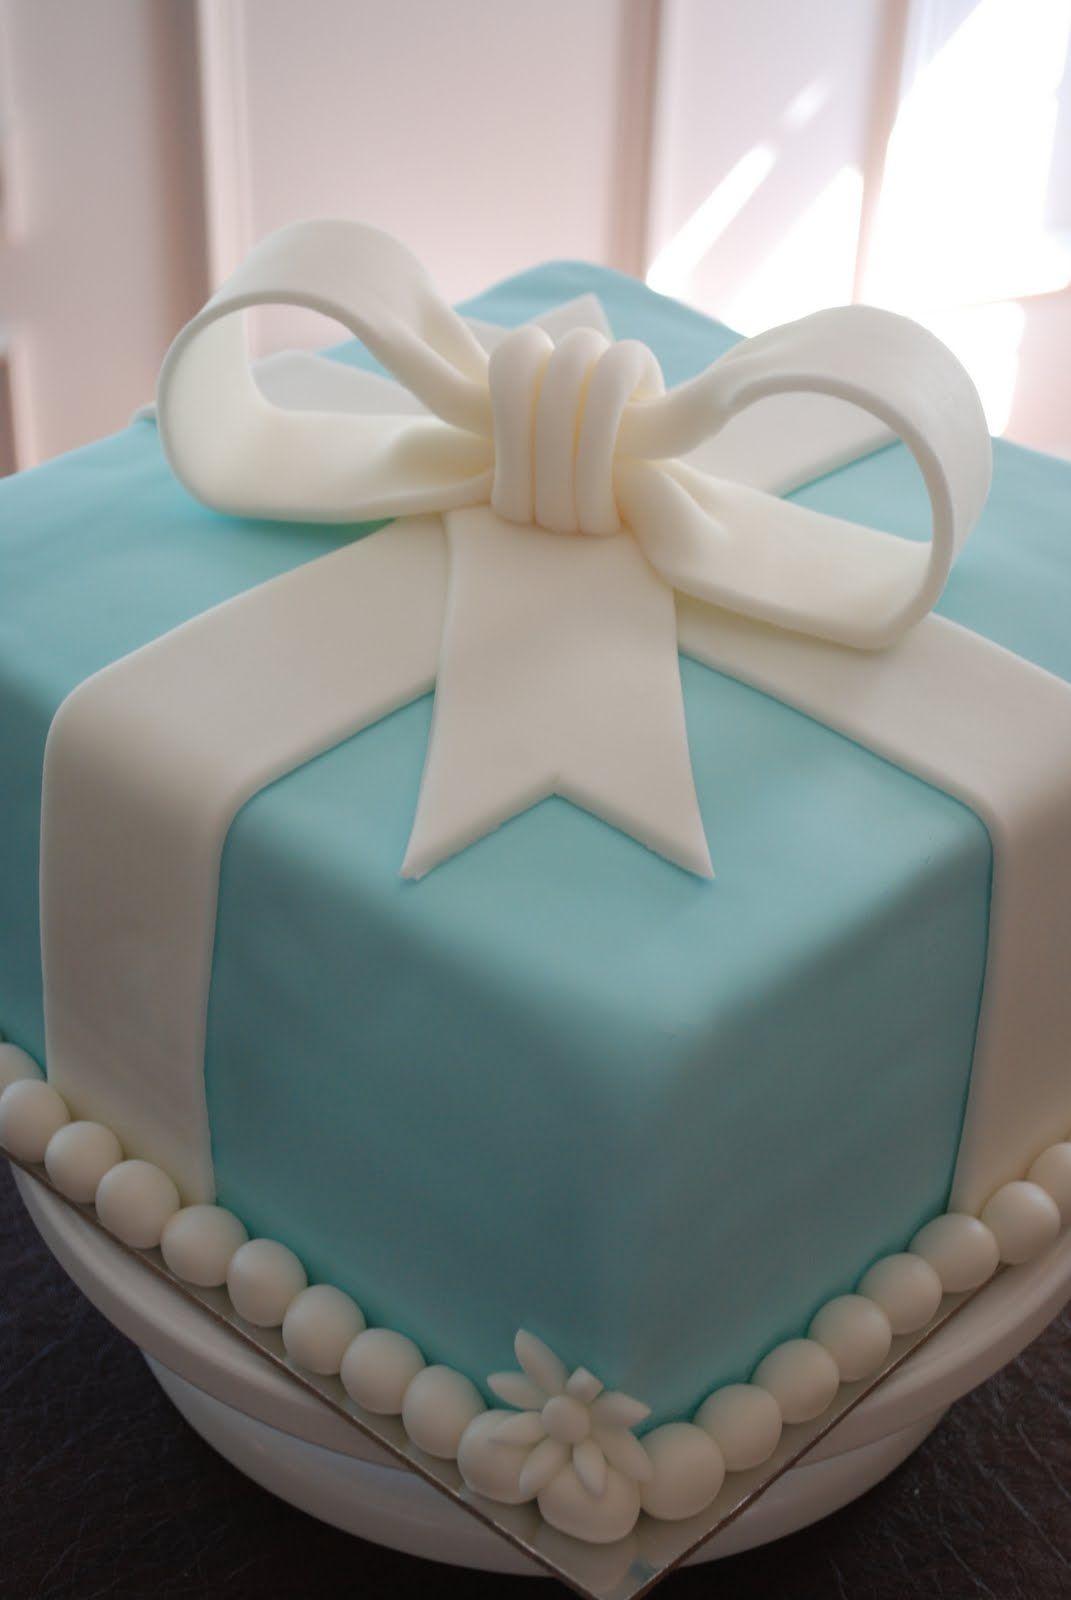 Tiffany Box Cake | Triple Chocolate Fudge Cake with Peanut Butter Filling, Fondant ...